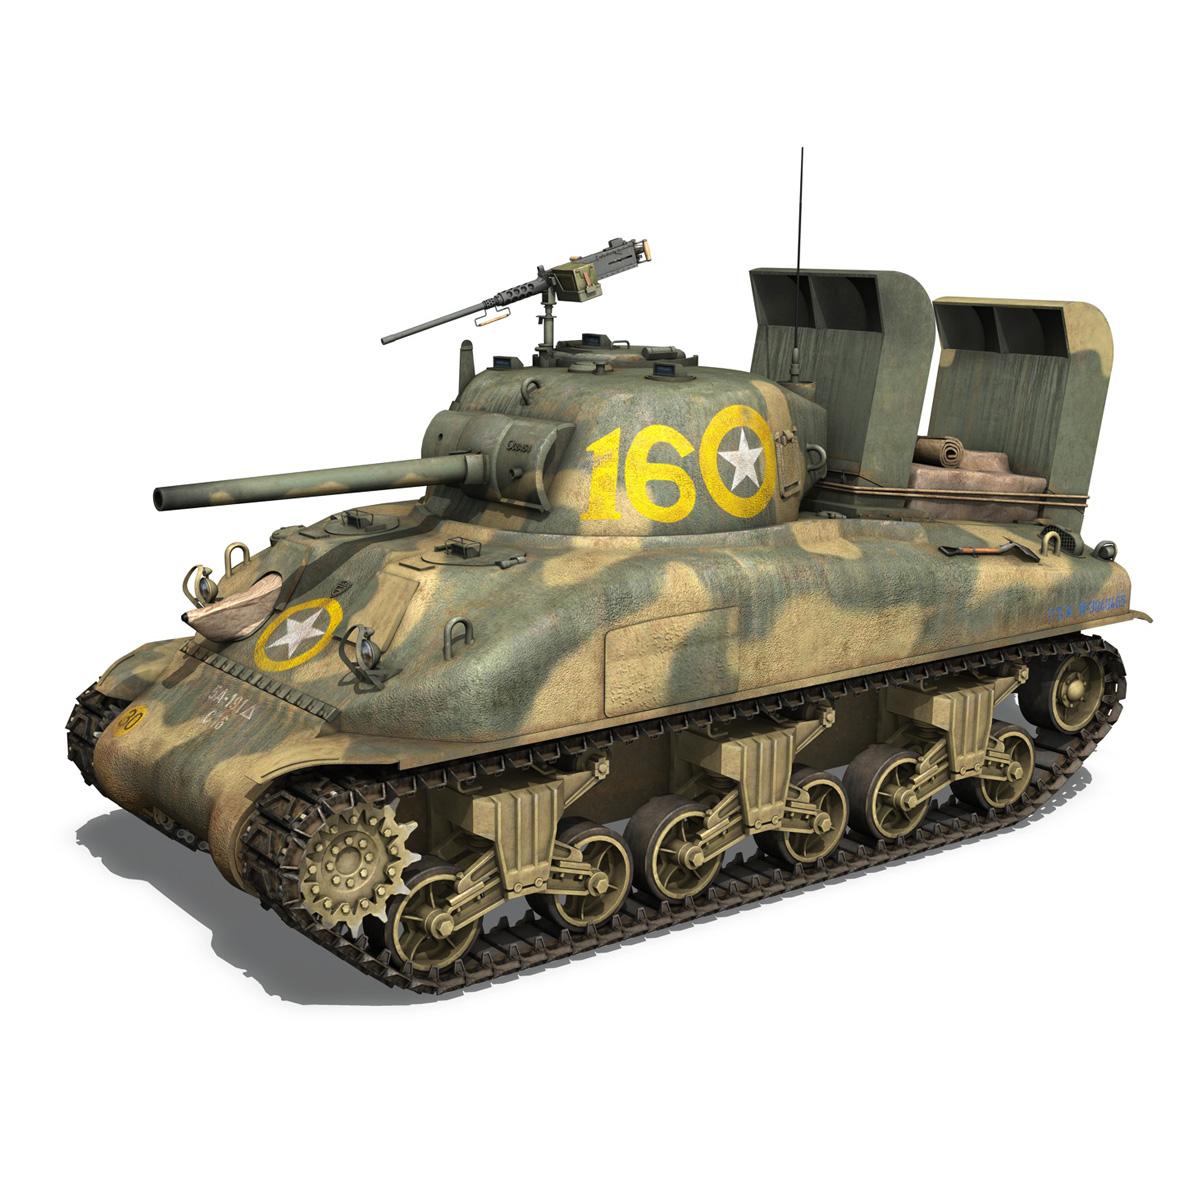 M4A1 Sherman - 16 3d model 3ds fbx c4d lwo lws lw obj 273052